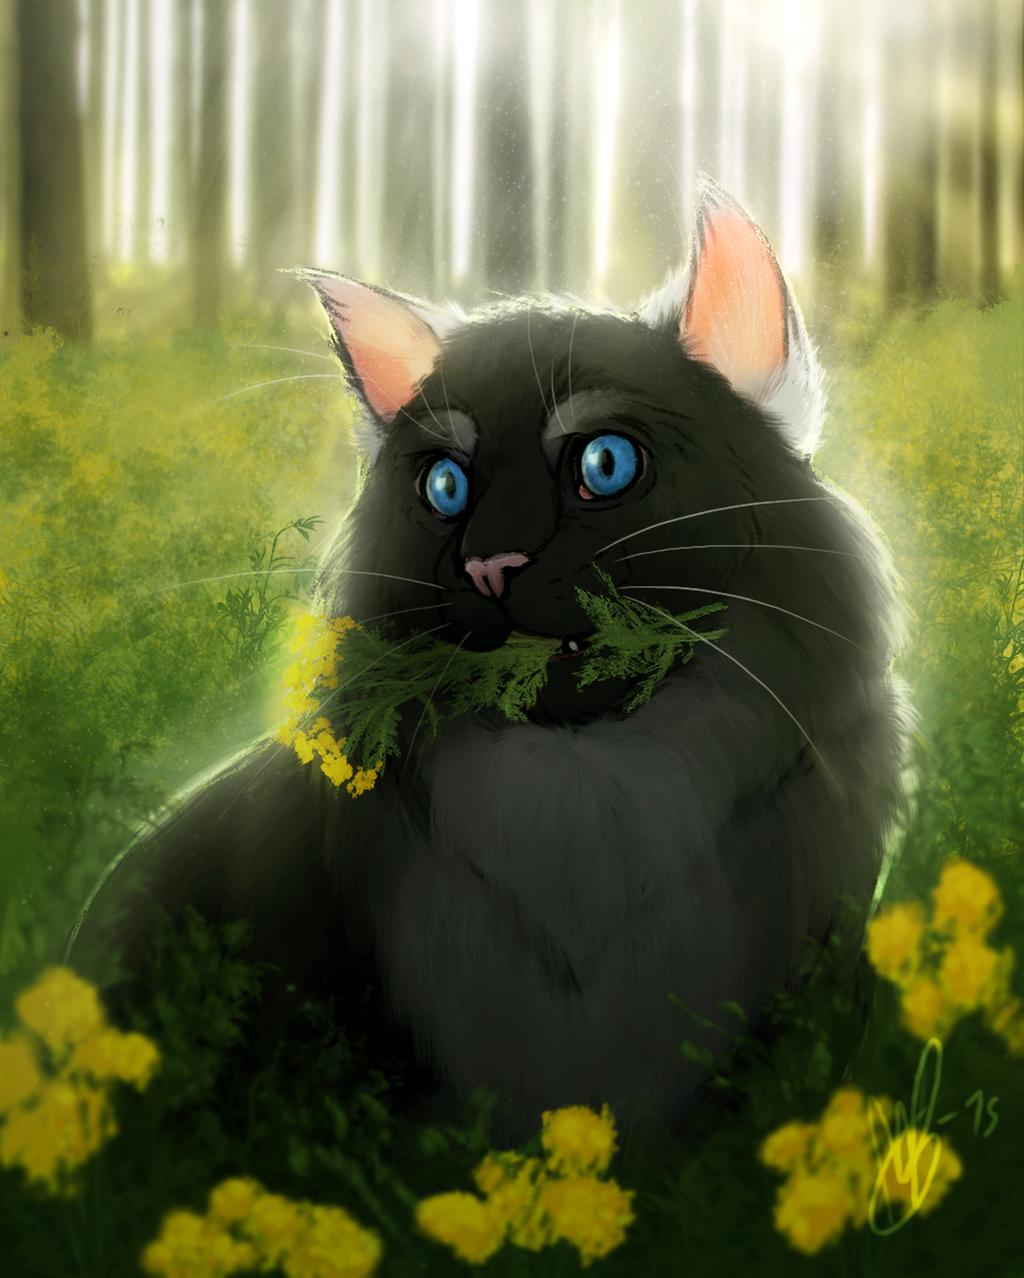 Warrior Cats Dawn Of The Clans Fanart: Cloud Spots: Pioneer Of Cat Medicine By HulluMel On DeviantArt